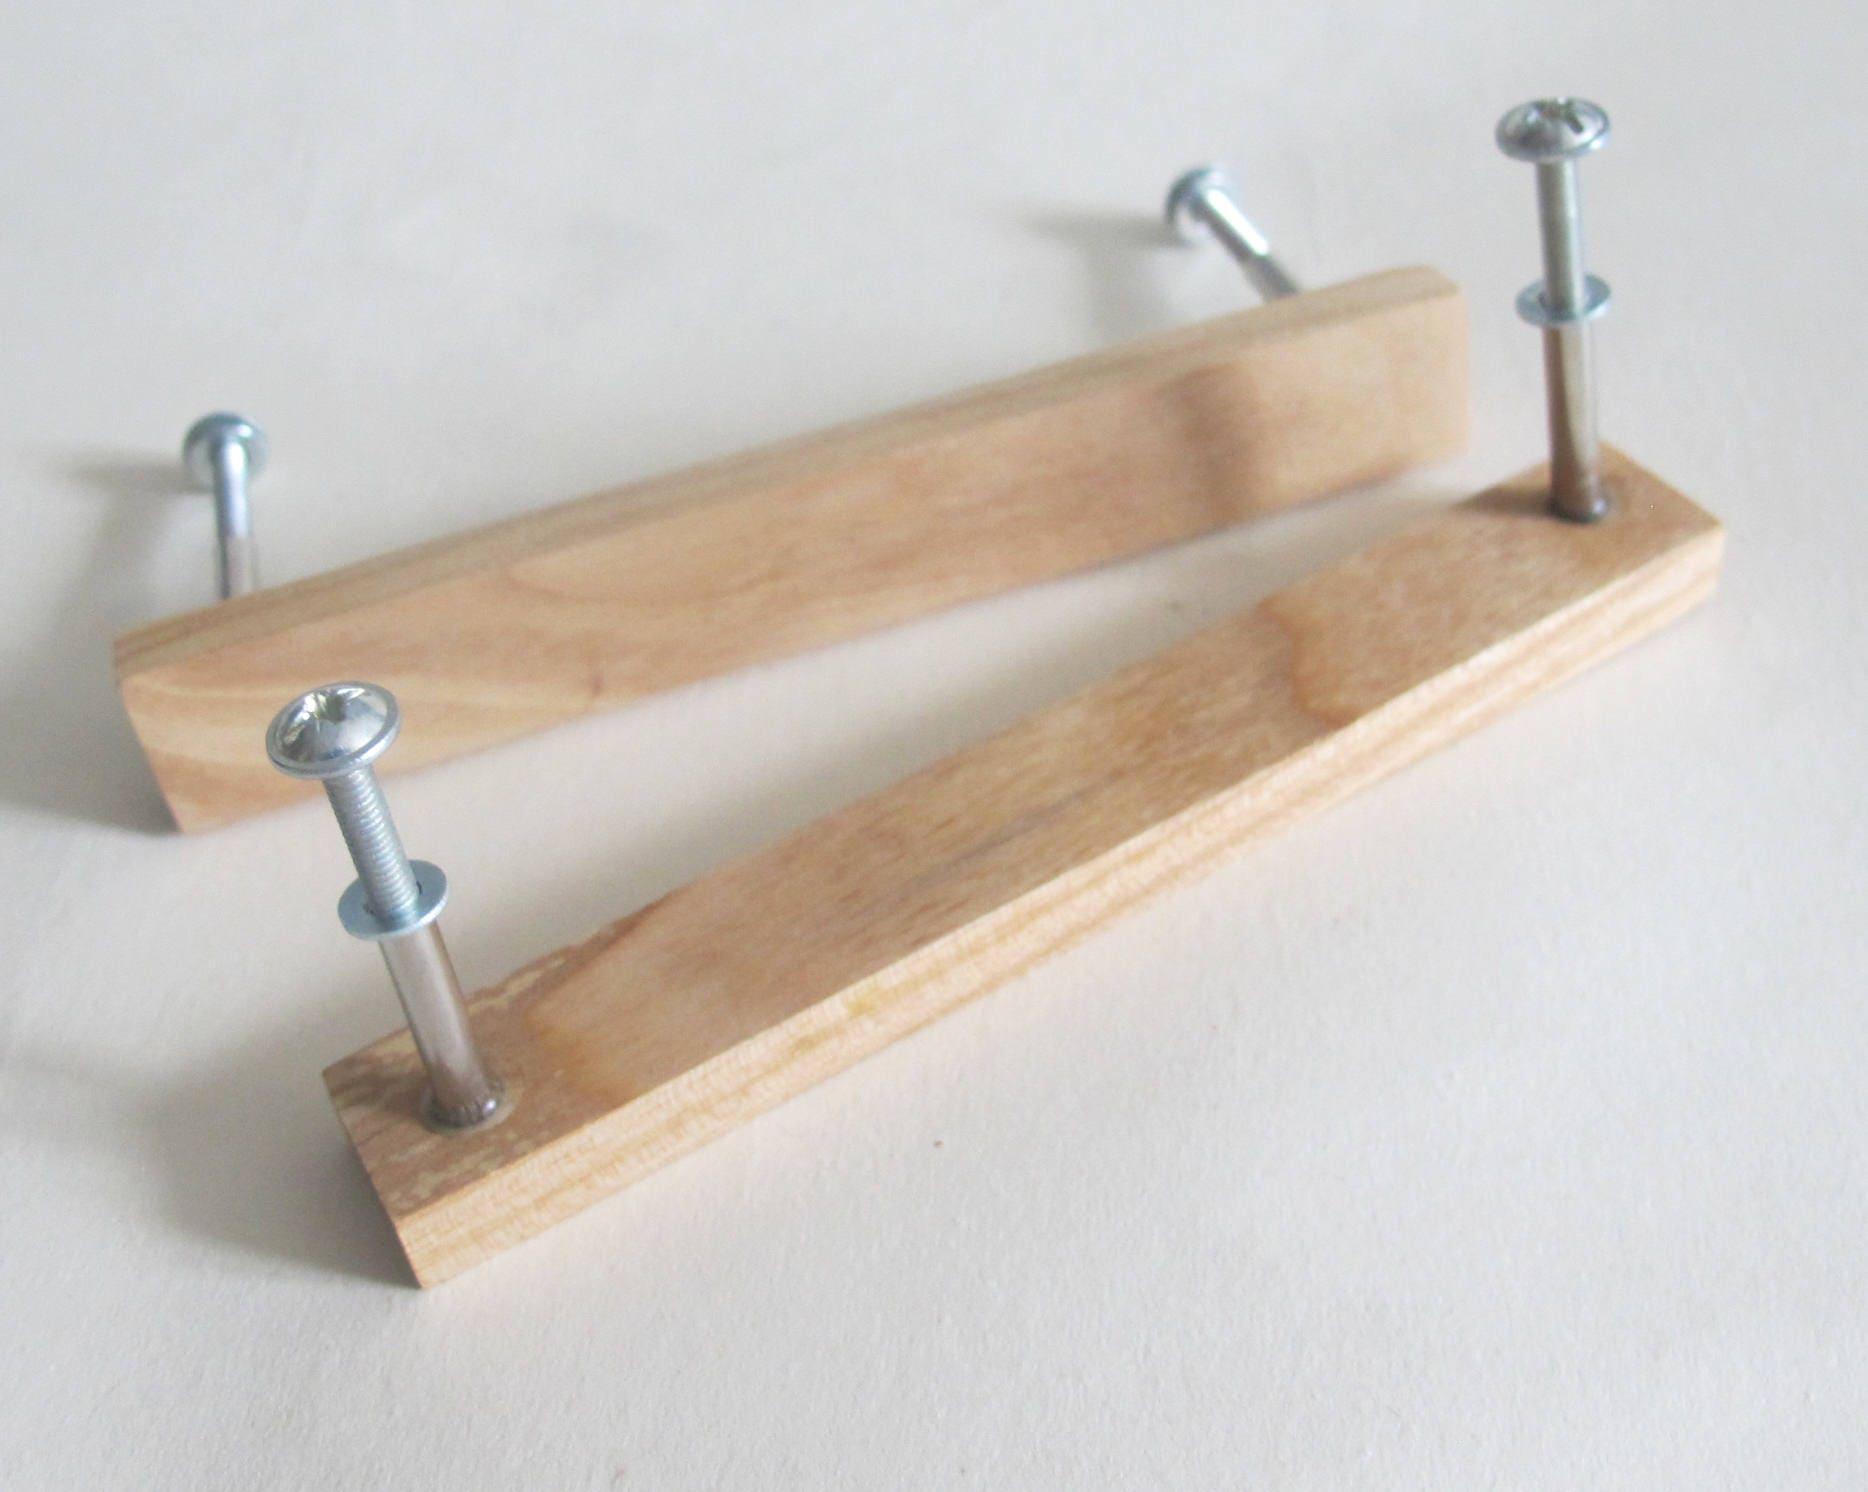 Wooden Drawer Pulls ~ Wooden drawer pulls set of oak wood handles